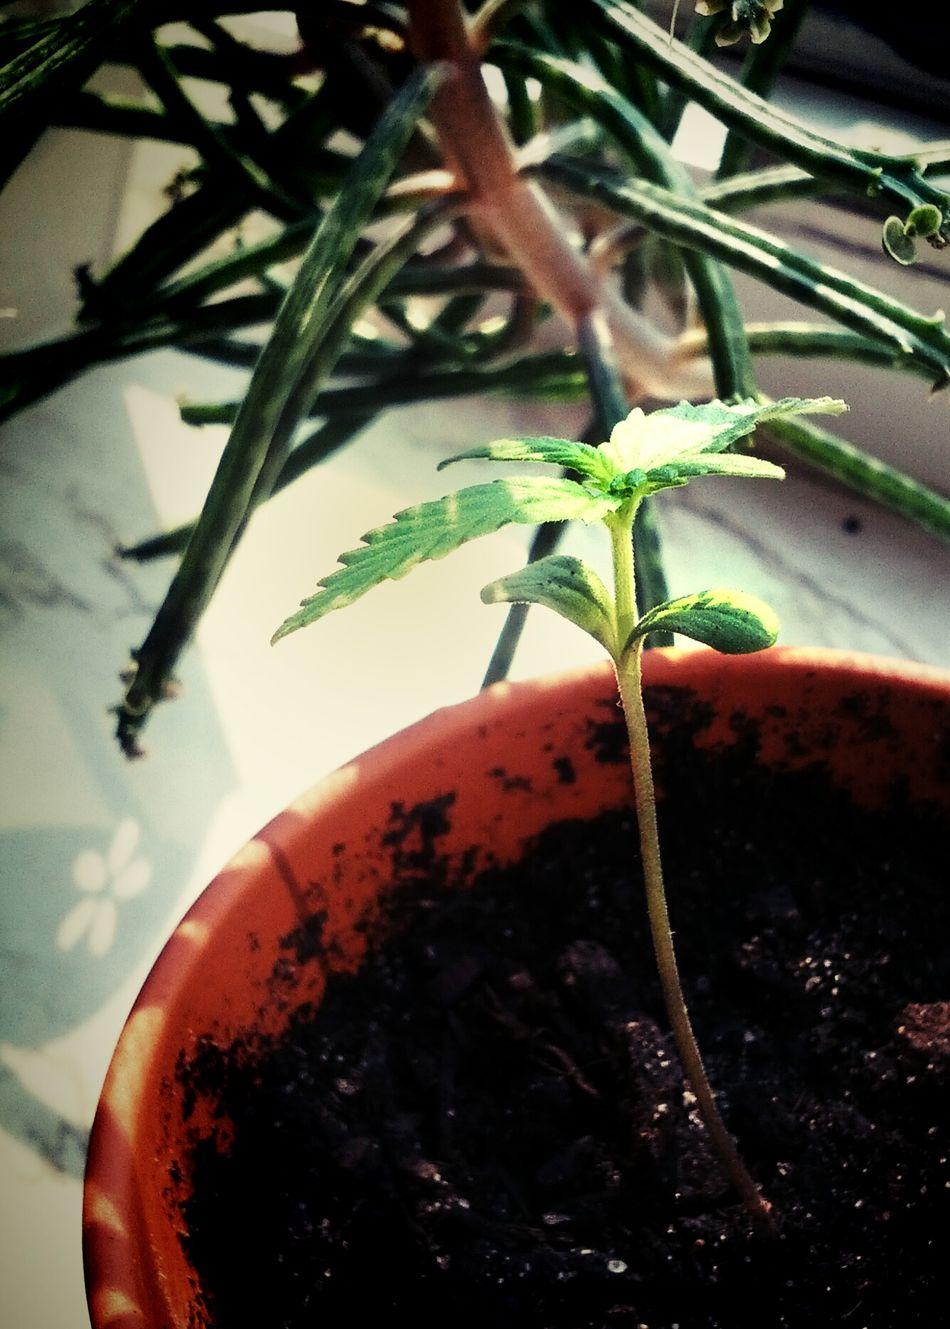 Growing Plants Watching Plants Grow Grow Slow